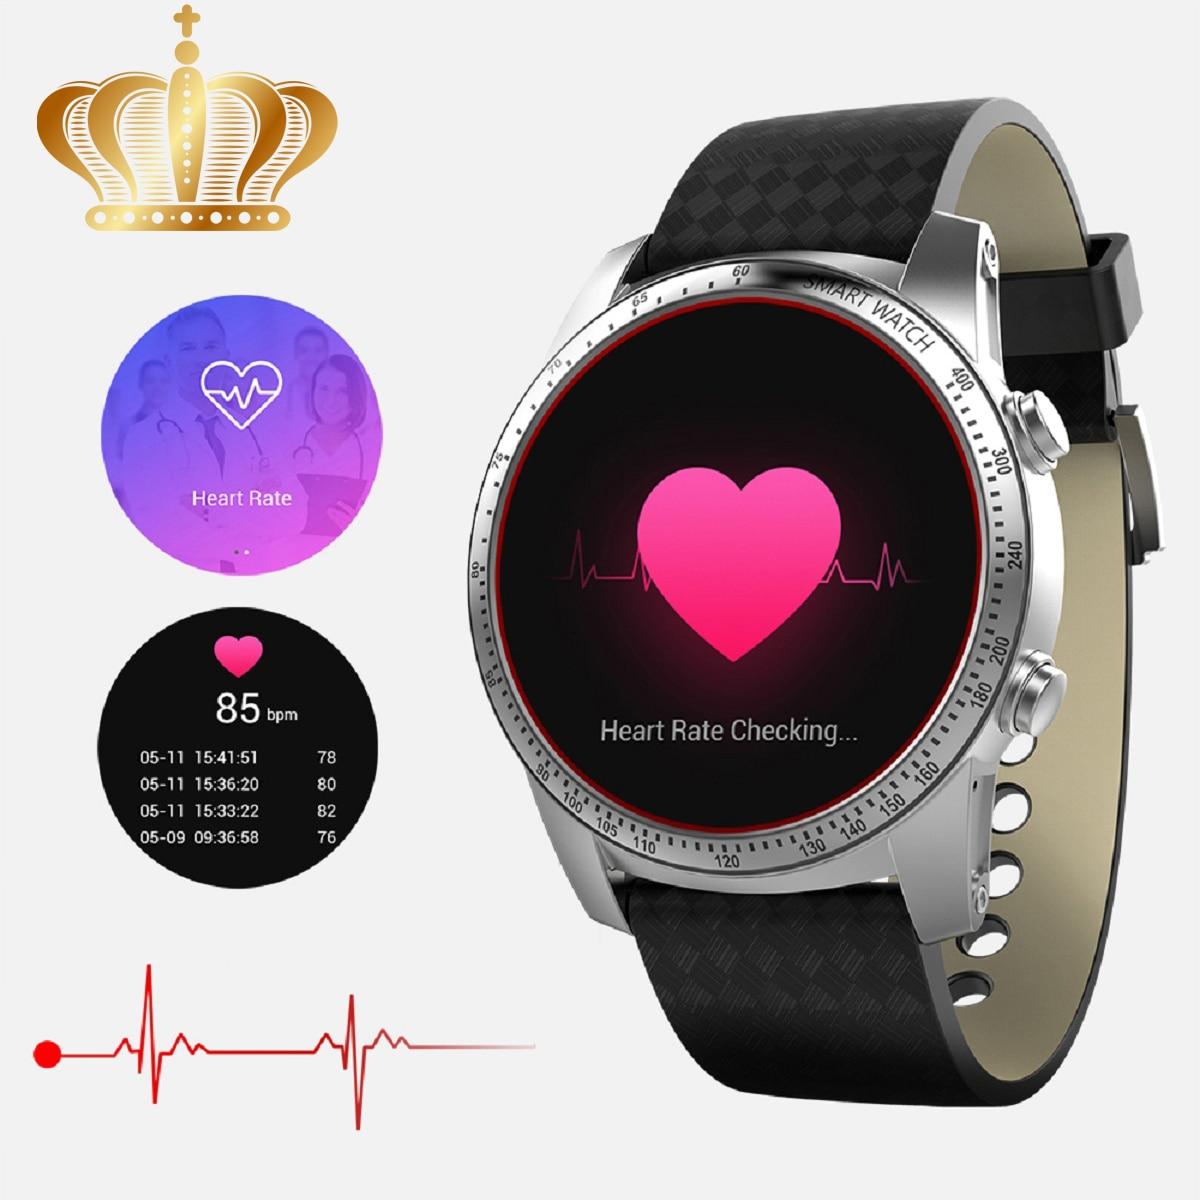 DTNO.1 KW99 Smart Watch Phone MTK6580 Smartwatch 3G WIFI GPS Watch Men Heart Rate Monitoring Bluetooth Android Phone IP68 jrgk kw99 3g smartwatch phone android 1 39 mtk6580 quad core heart rate monitor pedometer gps smart watch for mens pk kw88